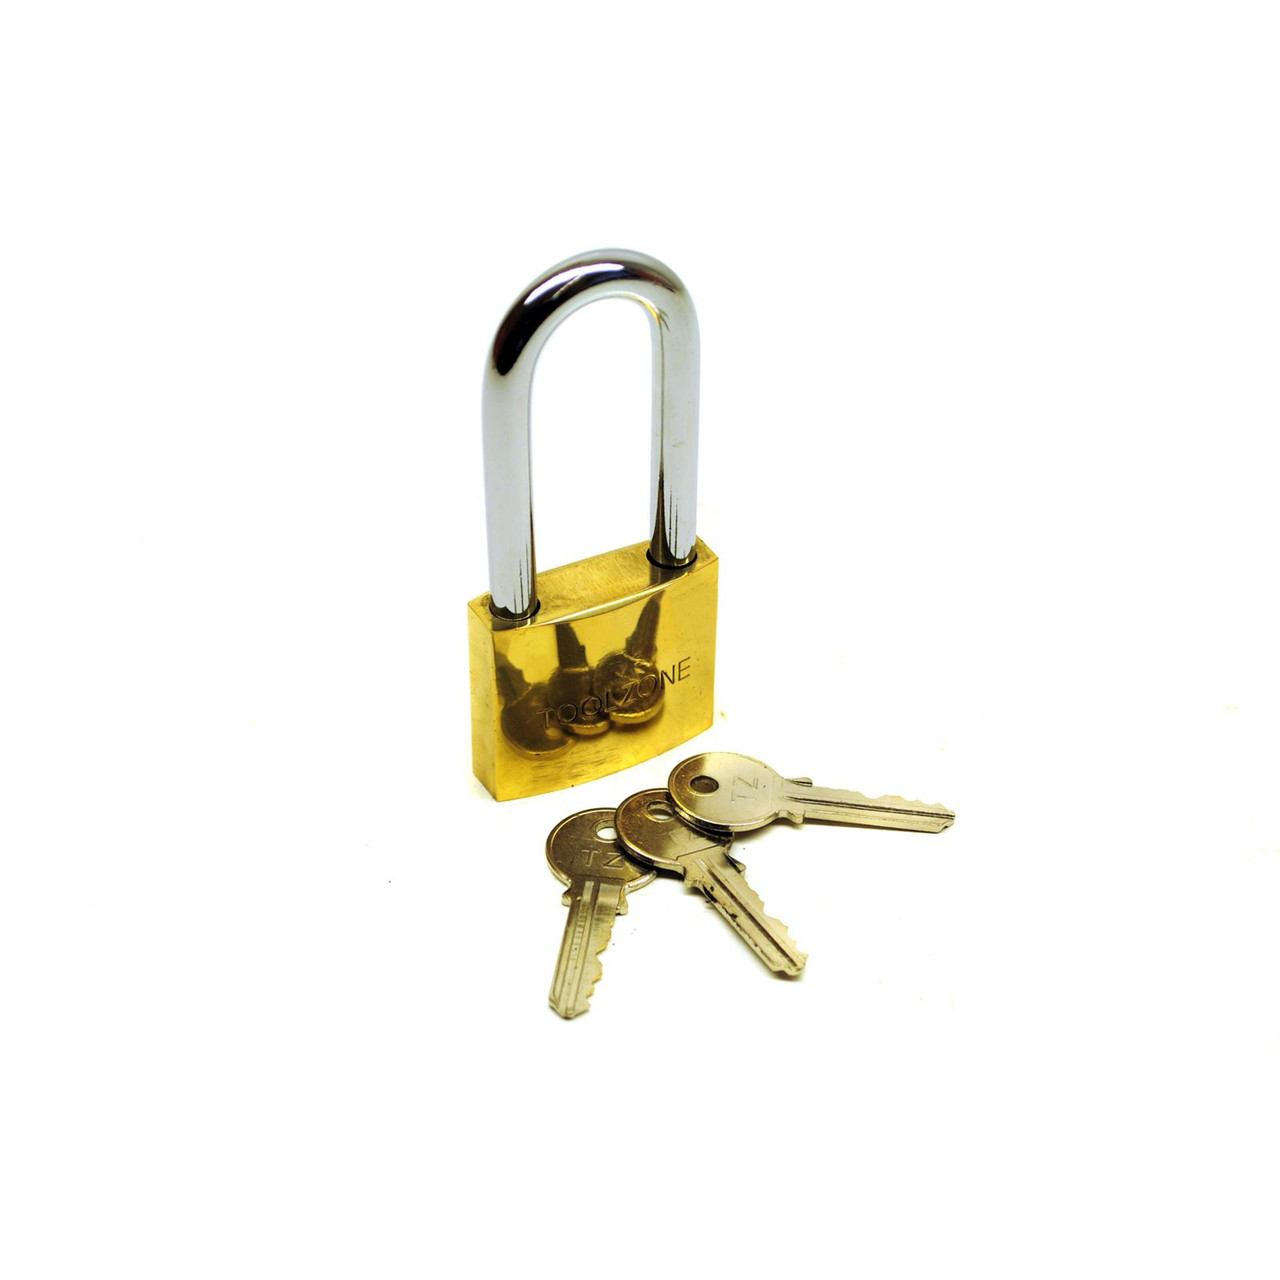 50mm long shackle brass padlock 3 keys security / lock / shed / garage TE620